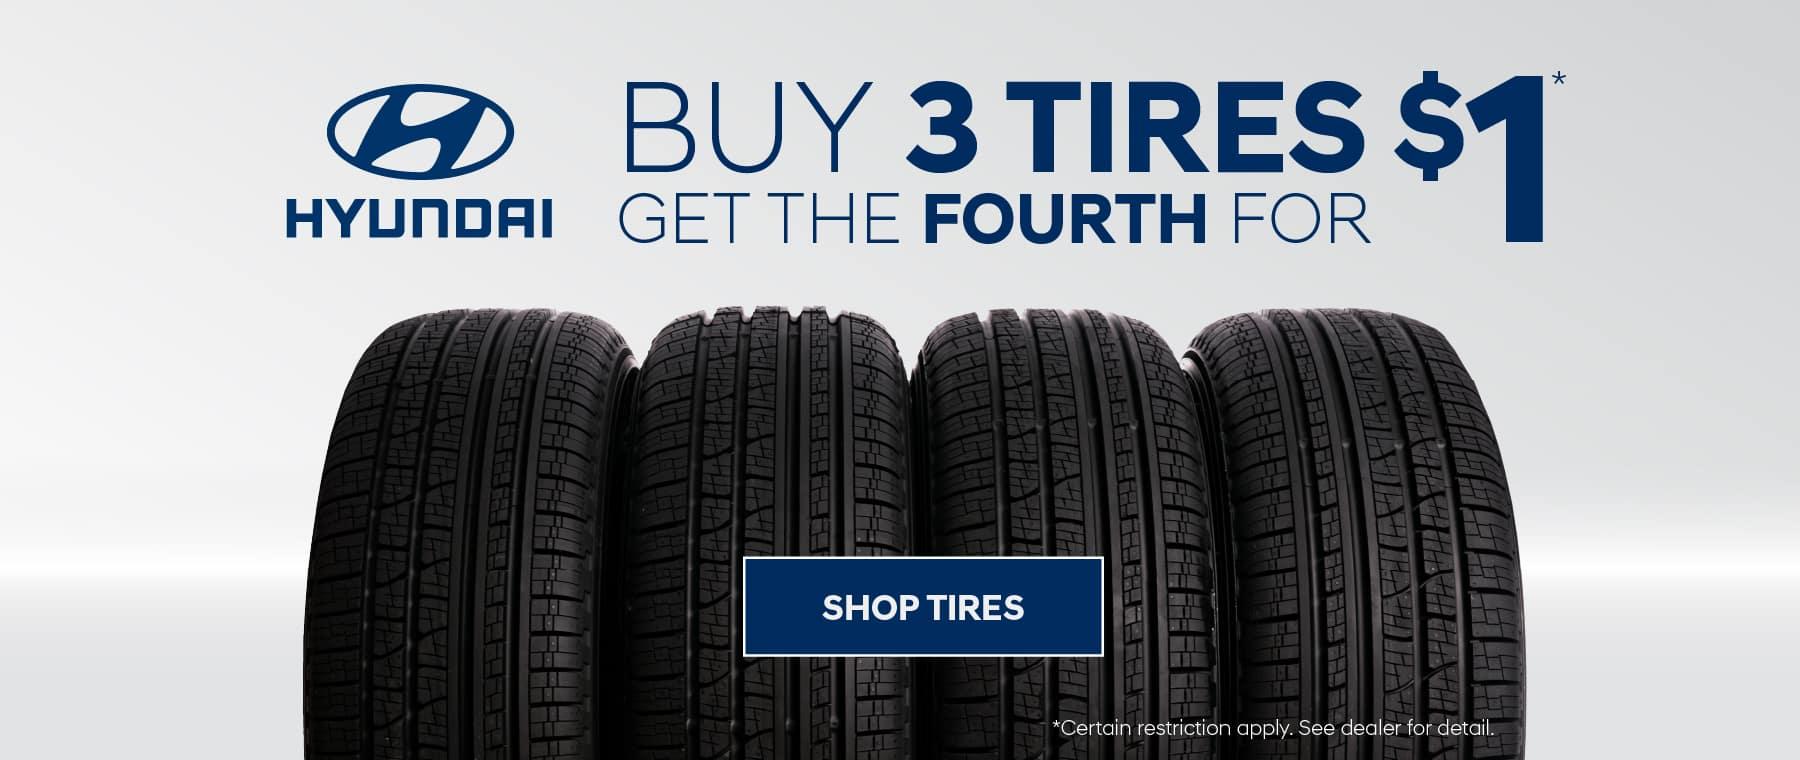 Buy 3 Tires Get 1 for $1 at Rosen Hyundai Greenfield